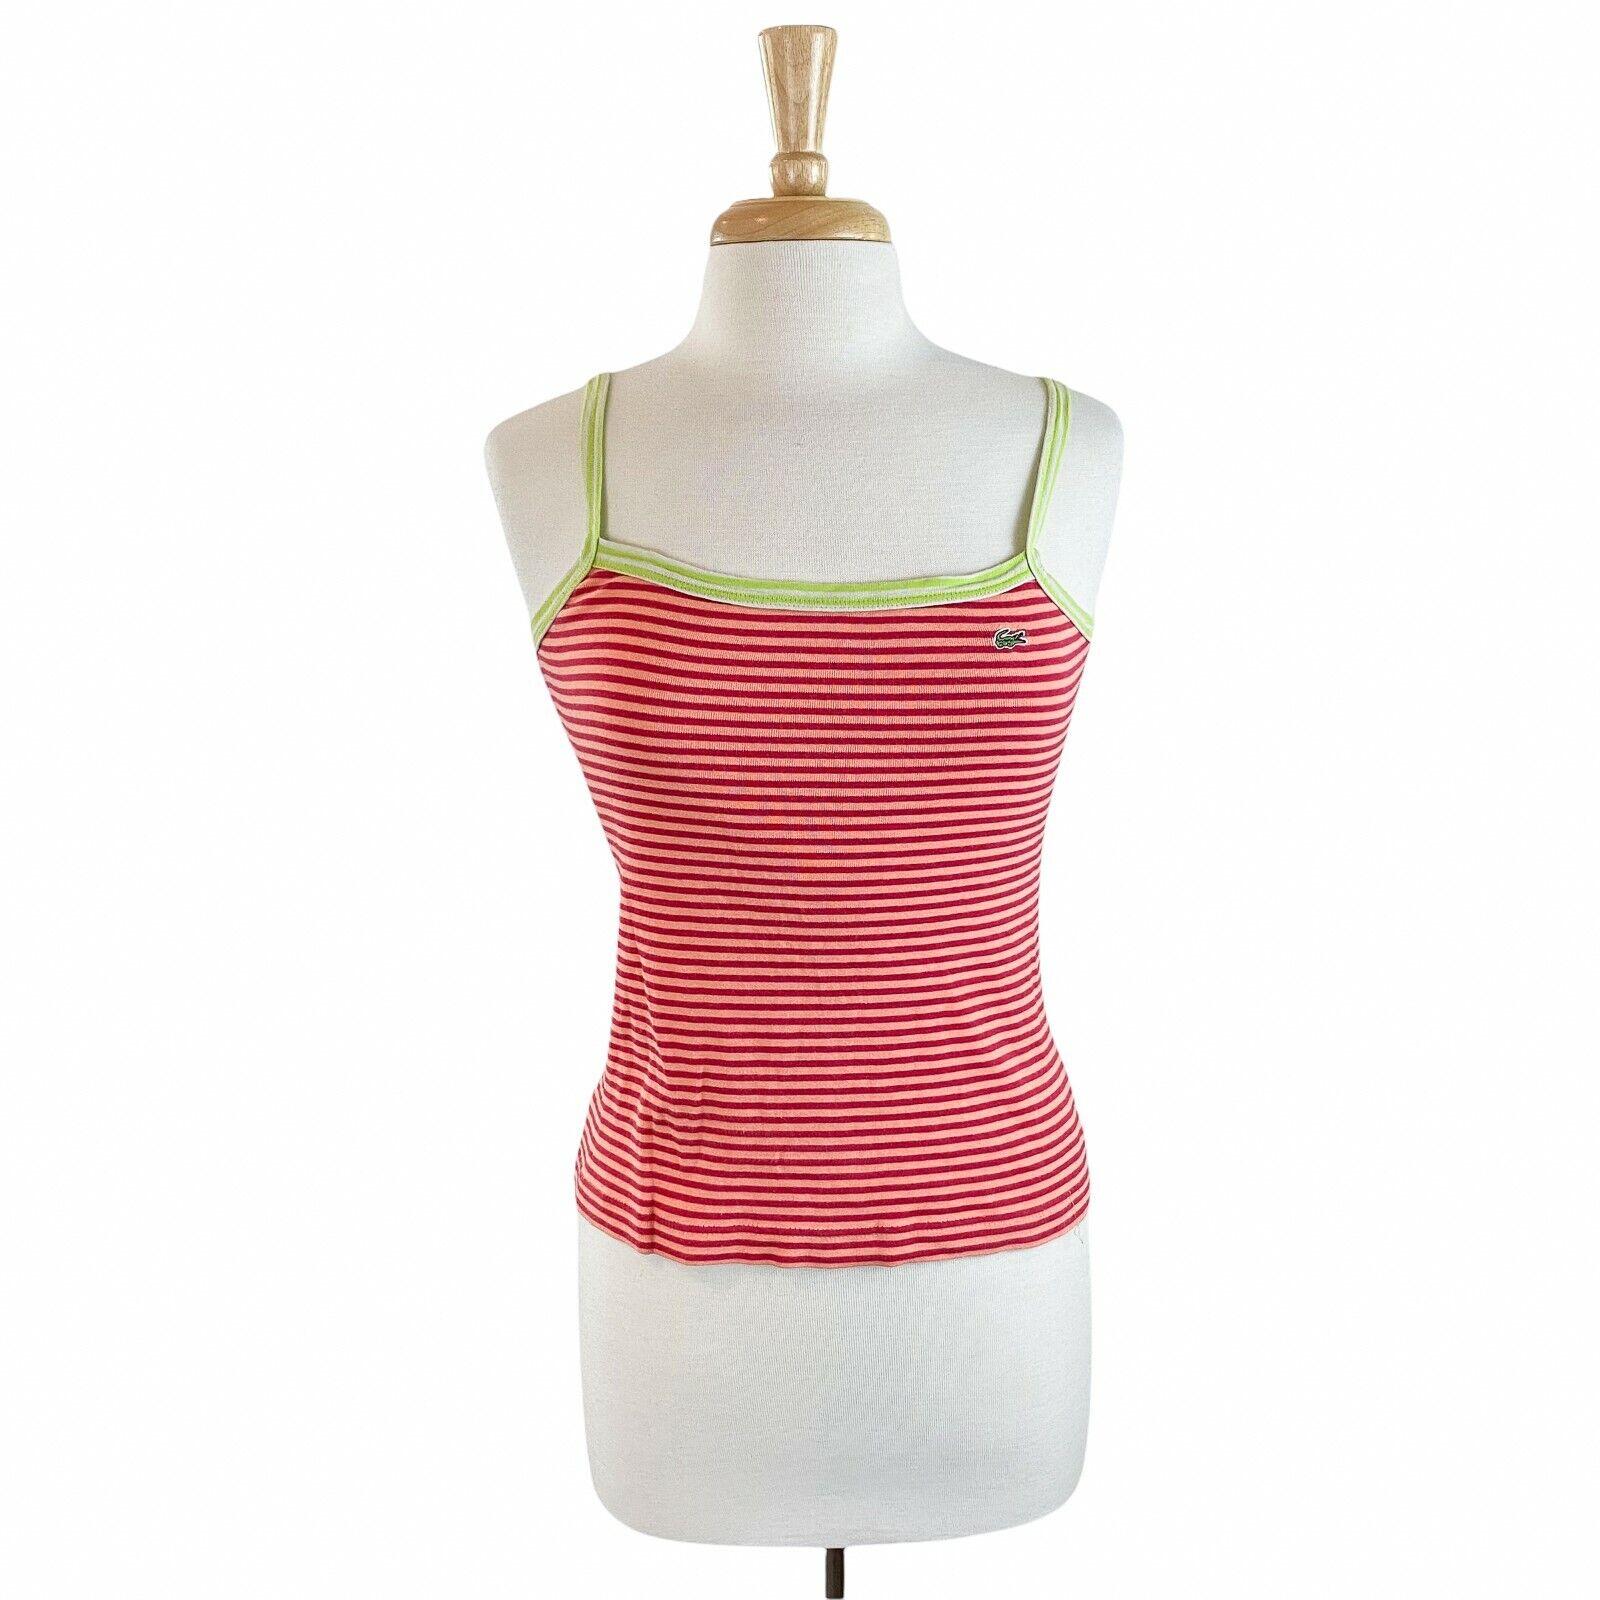 Lacoste Women s Orange Red Striped Pullover Tank Top Shirt Size 40 Medium - $24.99